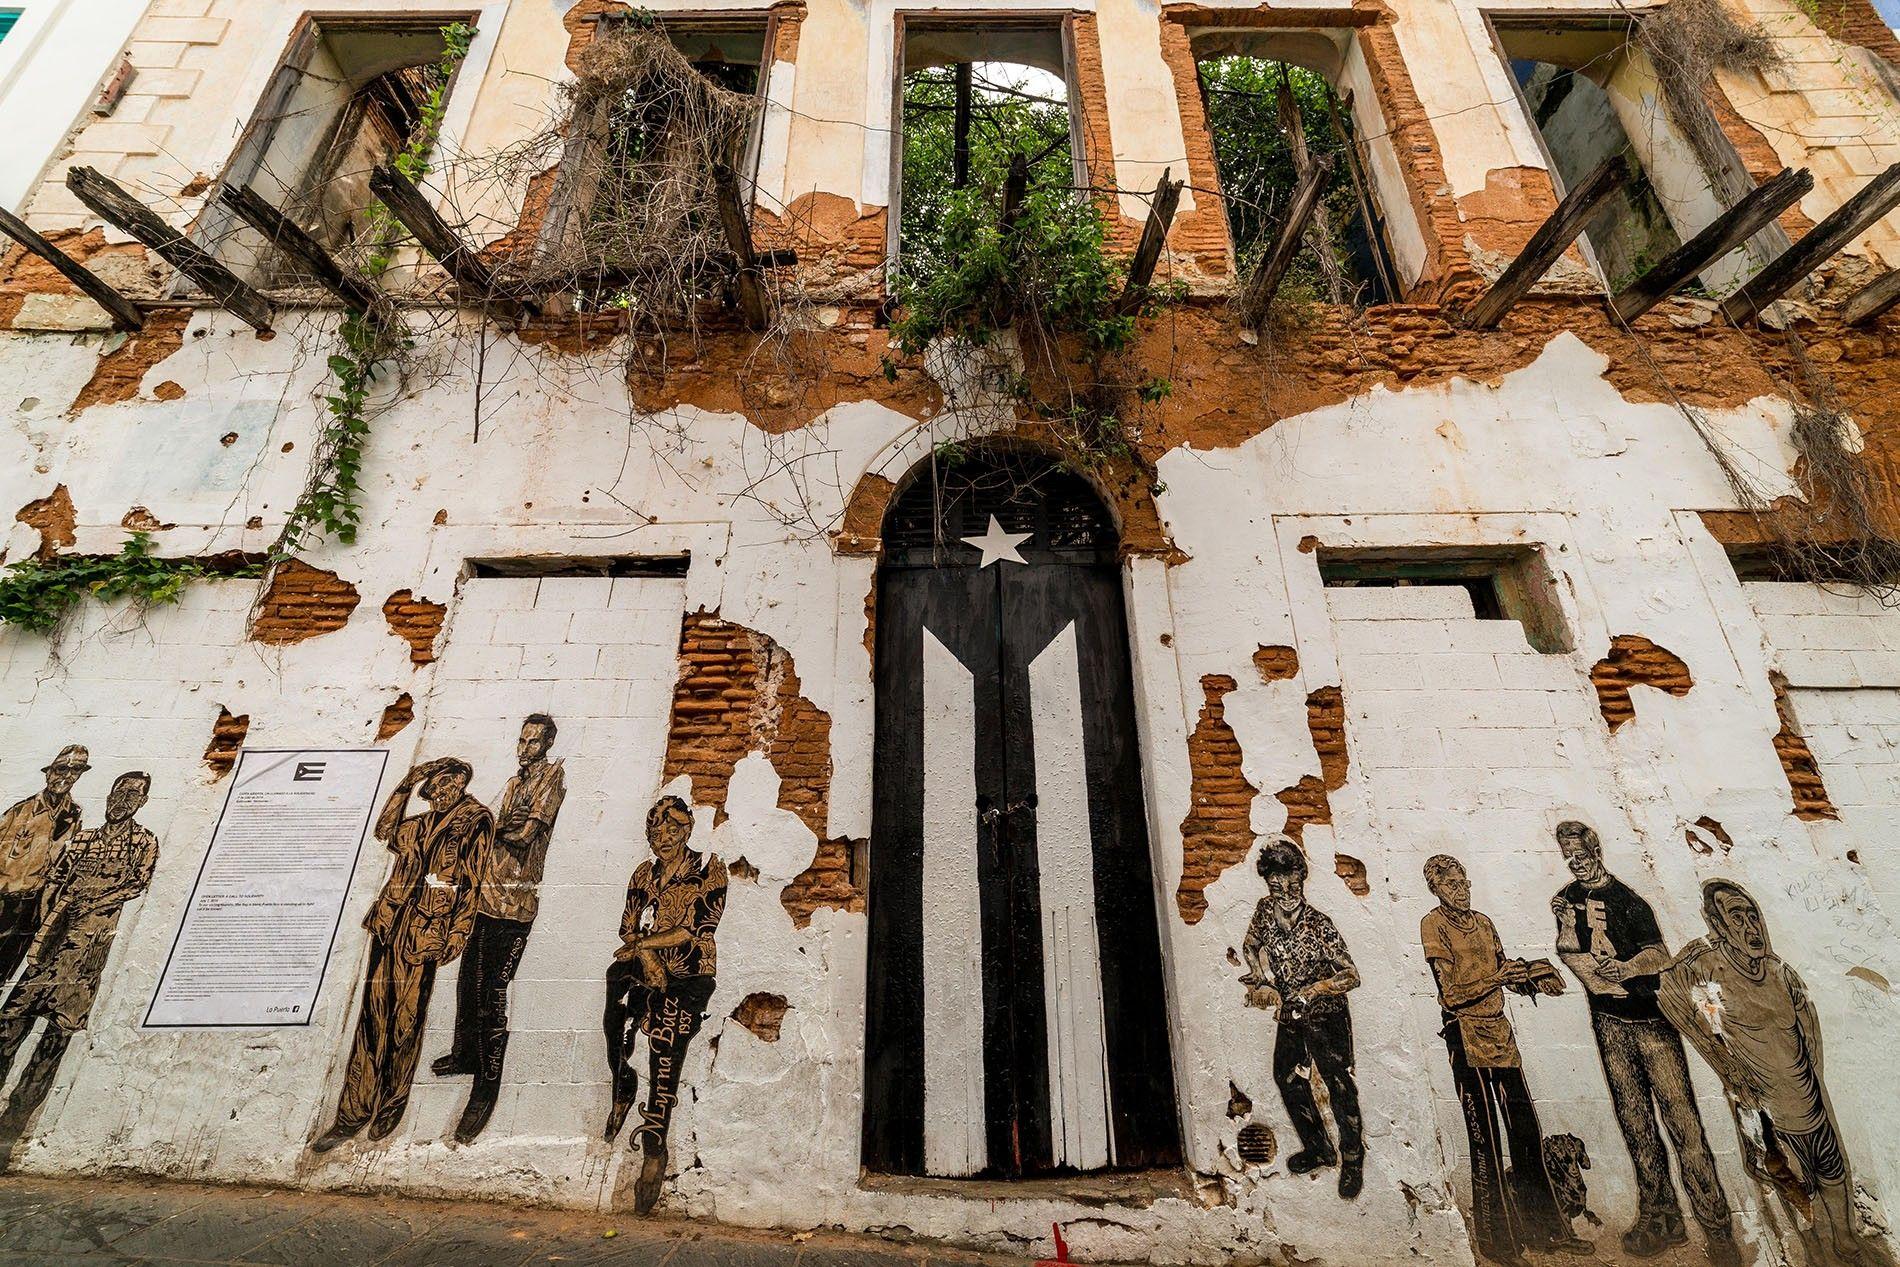 La Puerta de la Bandera in Old San Juan, painted black and white in protest of ...